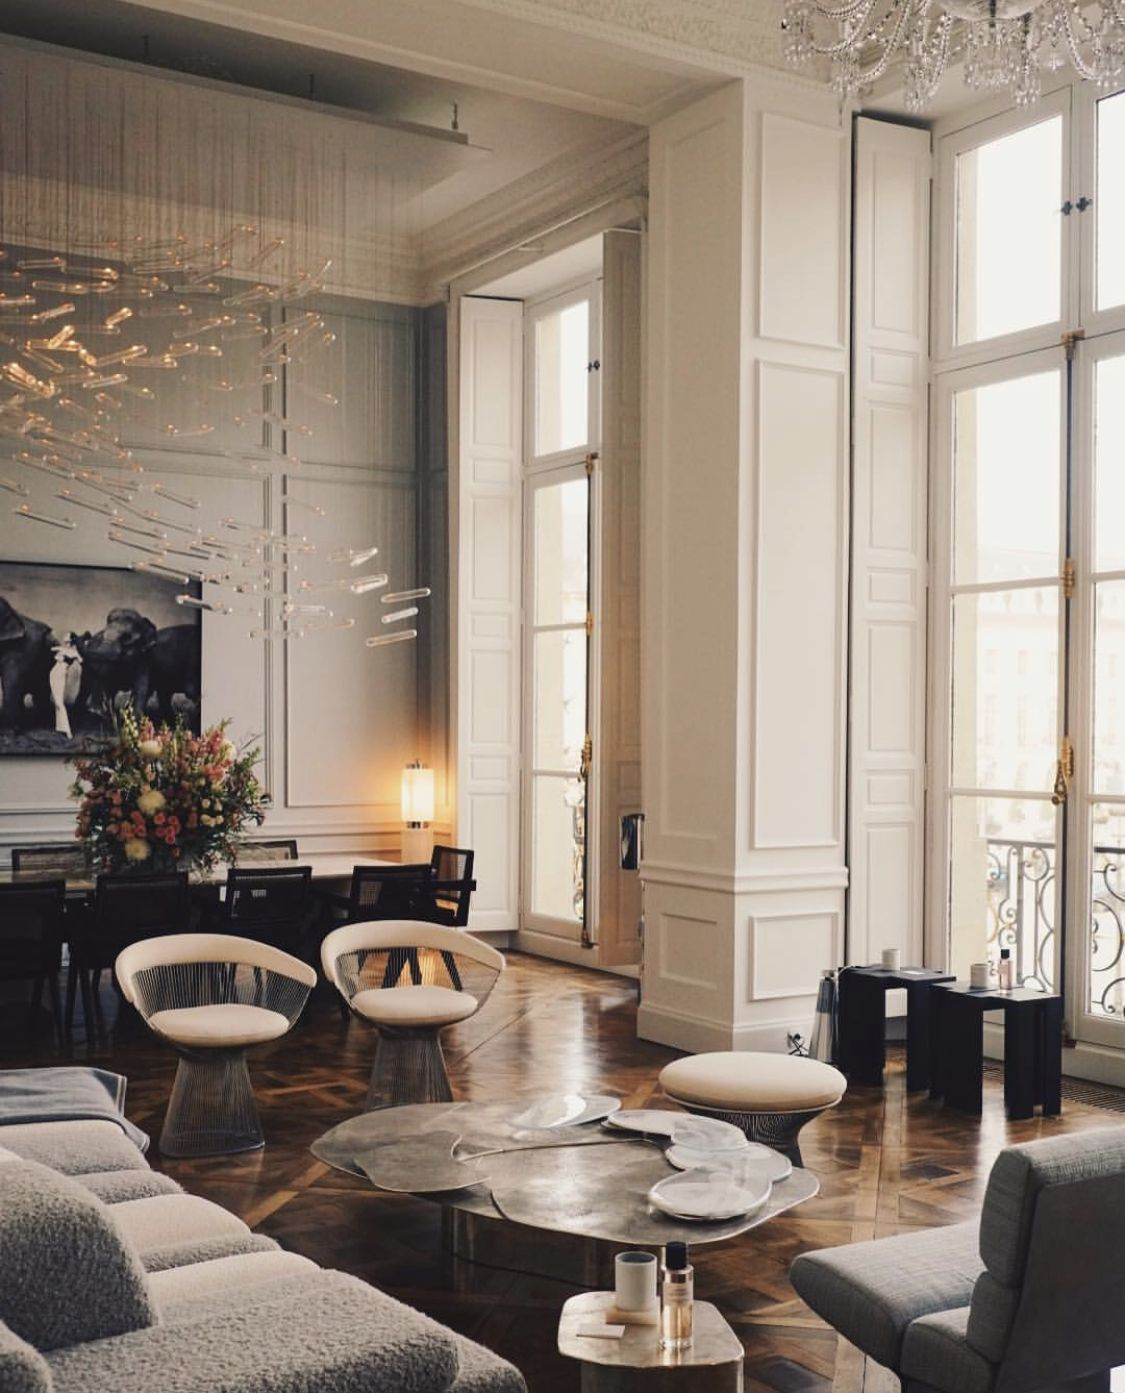 Living Room Decor Inspiration: House Update & Inspiration